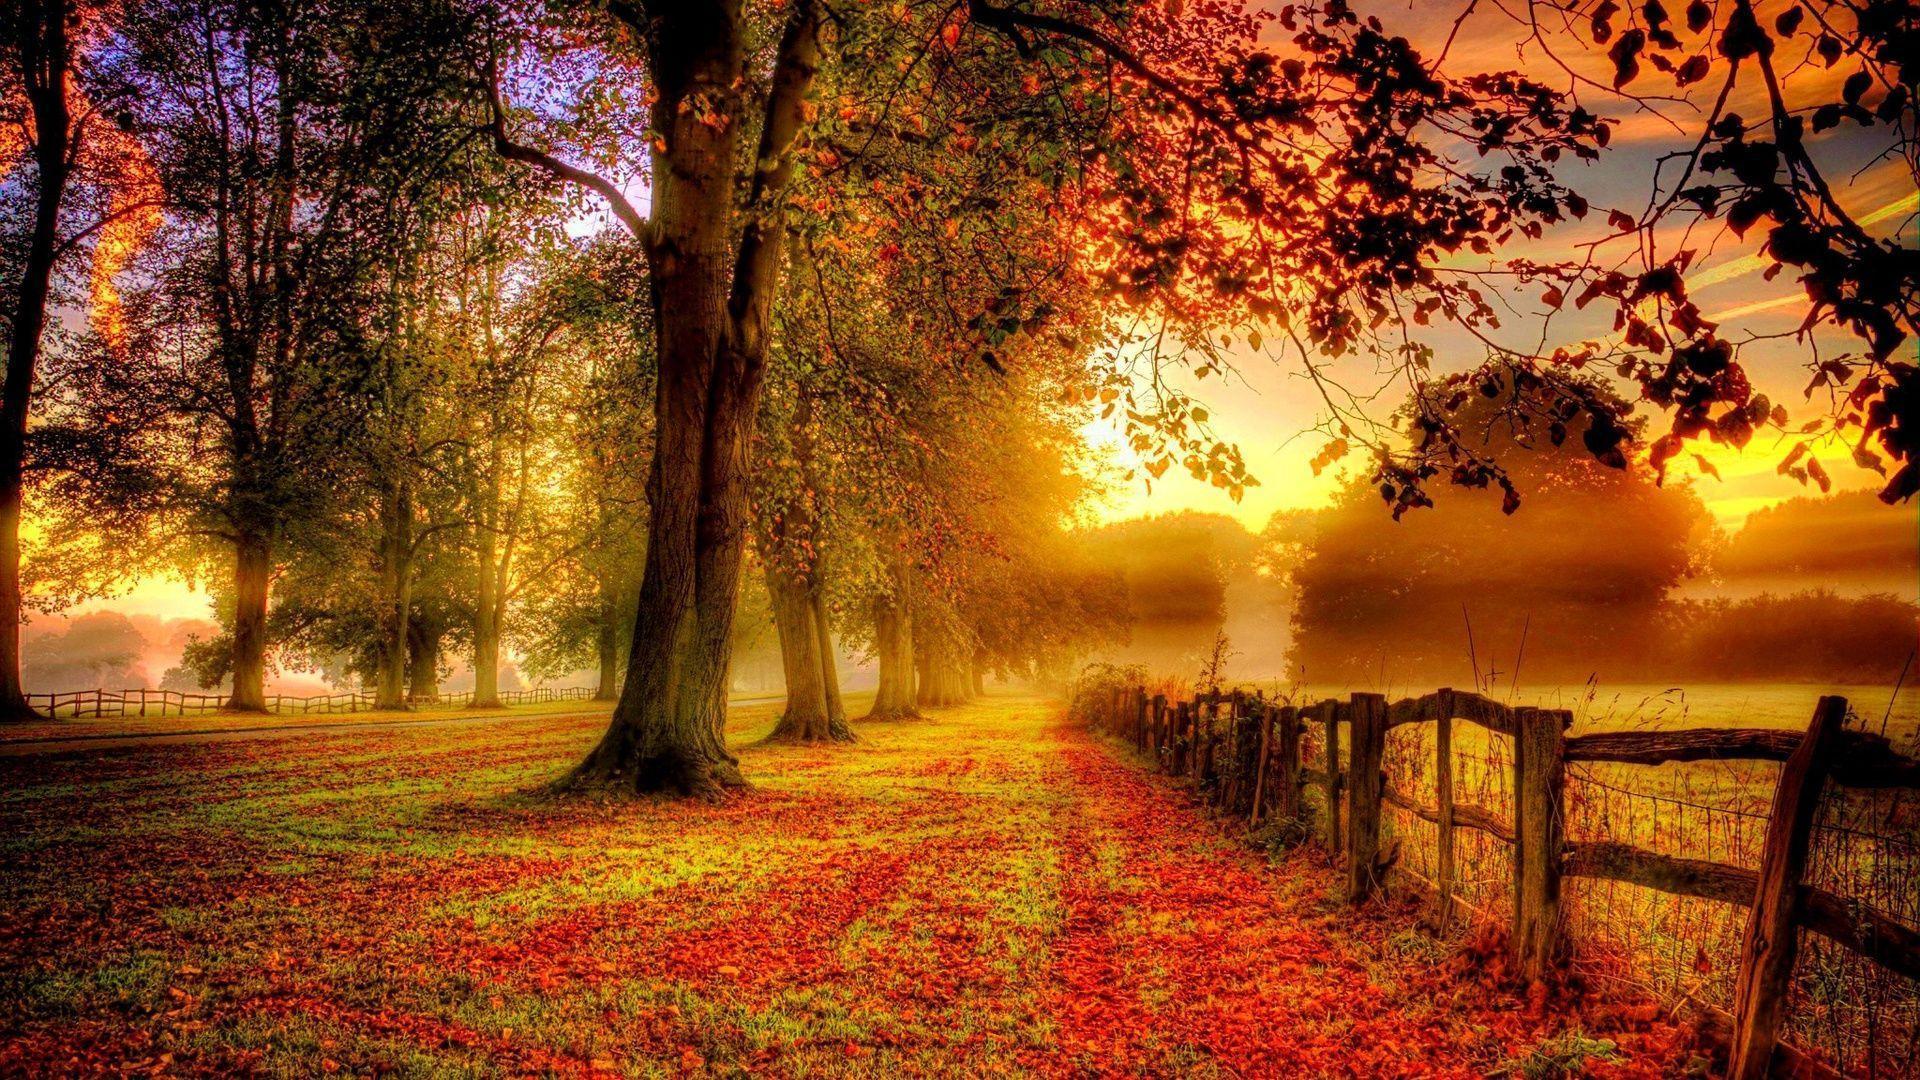 Autumn Desktop Wallpapers Top Free Autumn Desktop Backgrounds Wallpaperaccess